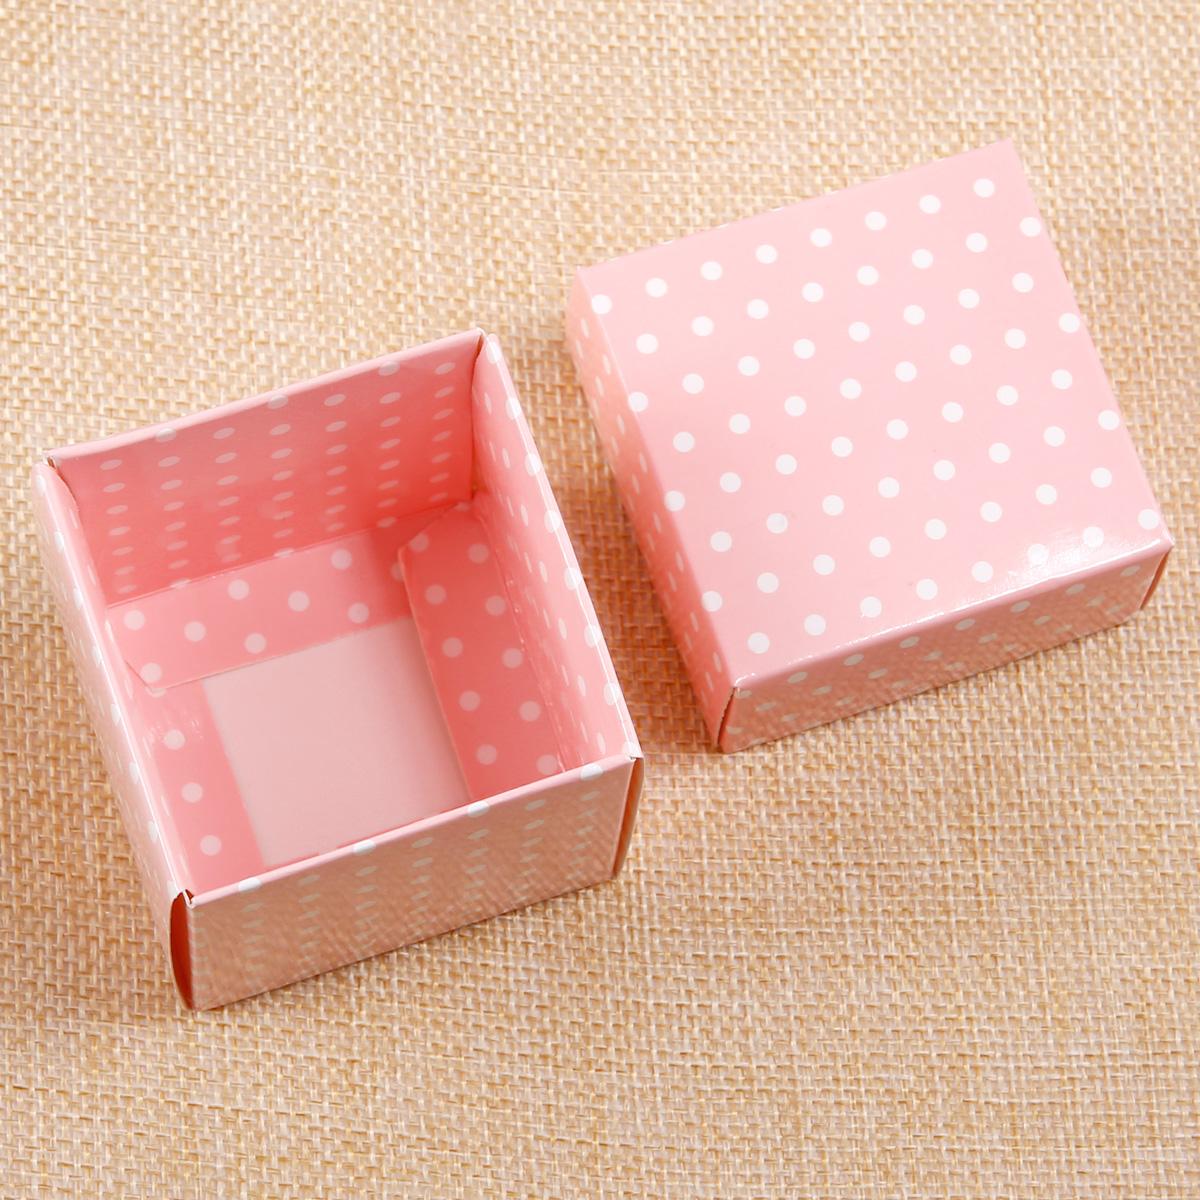 Pack de 50 Nati Caja de Regalo 7.5x7.5x3cm - Cajita de Papel Kraft Cajas de Cart/ón para Joya Dulces Jab/ón Hecho a Mano Embalaje de Regalo para Boda Cumplea/ños Bautizo L